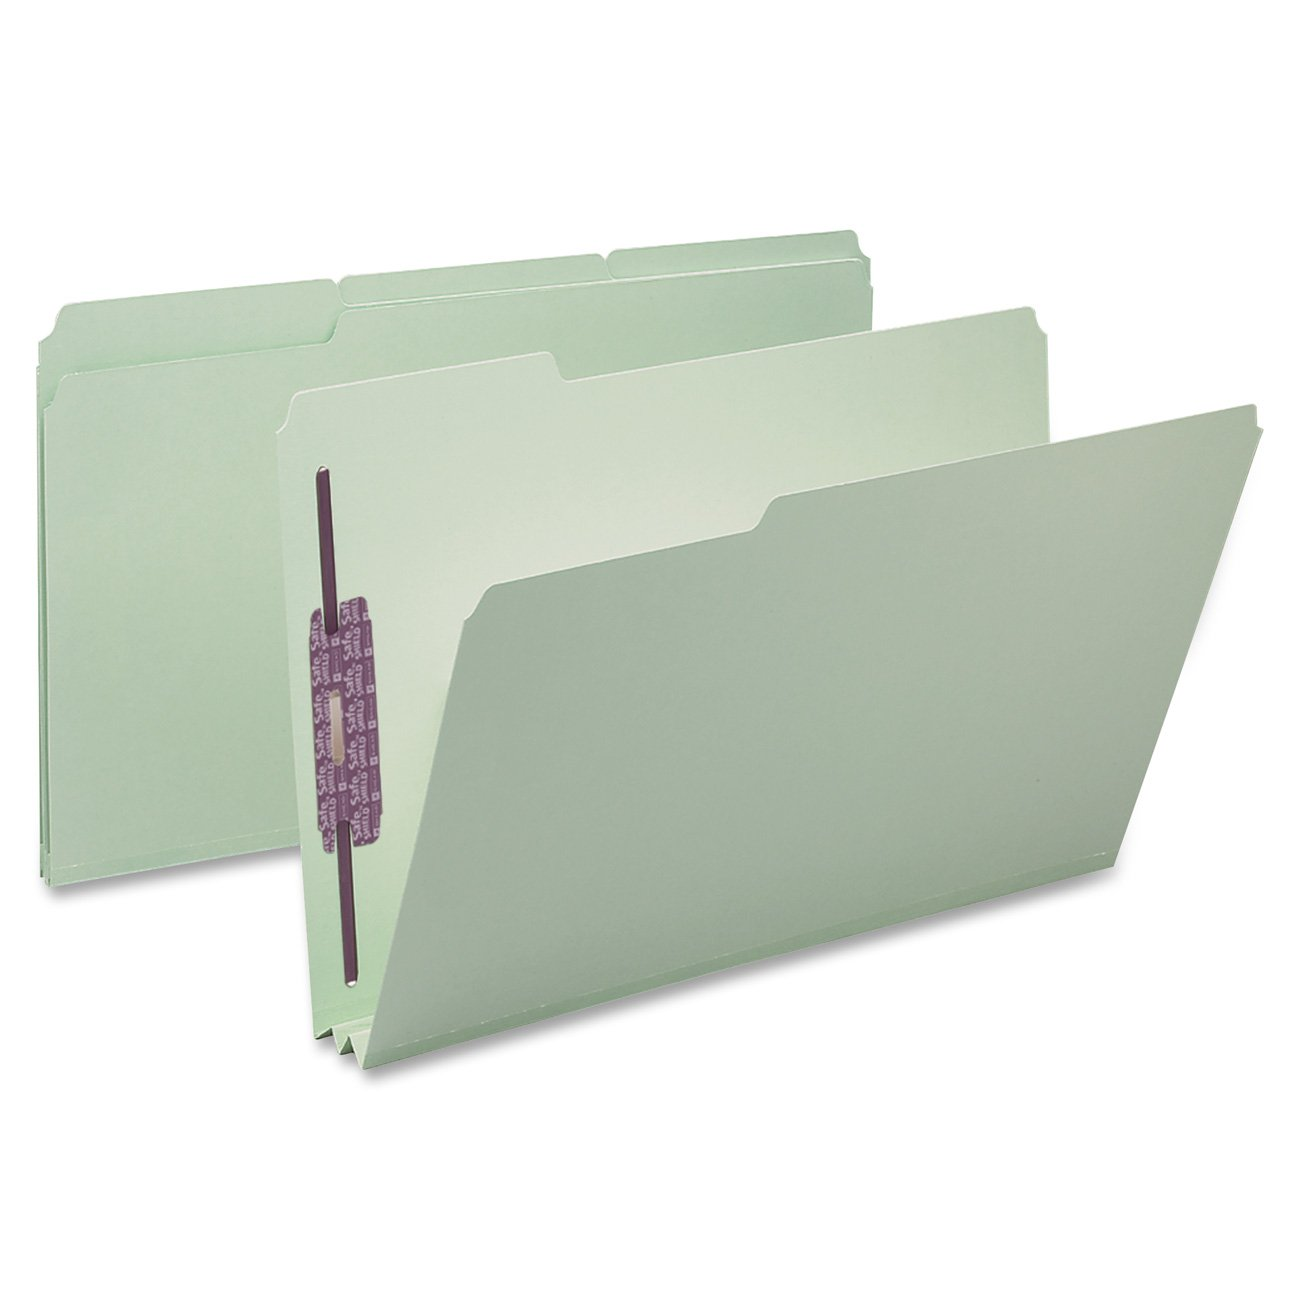 Smead Pressboard Fastener File Folder with SafeSHIELD Fasteners, 2 Fasteners, 1/3-Cut Tab, 2'' Expansion, Legal Size, Gray/Green, 25 per Box (19934)